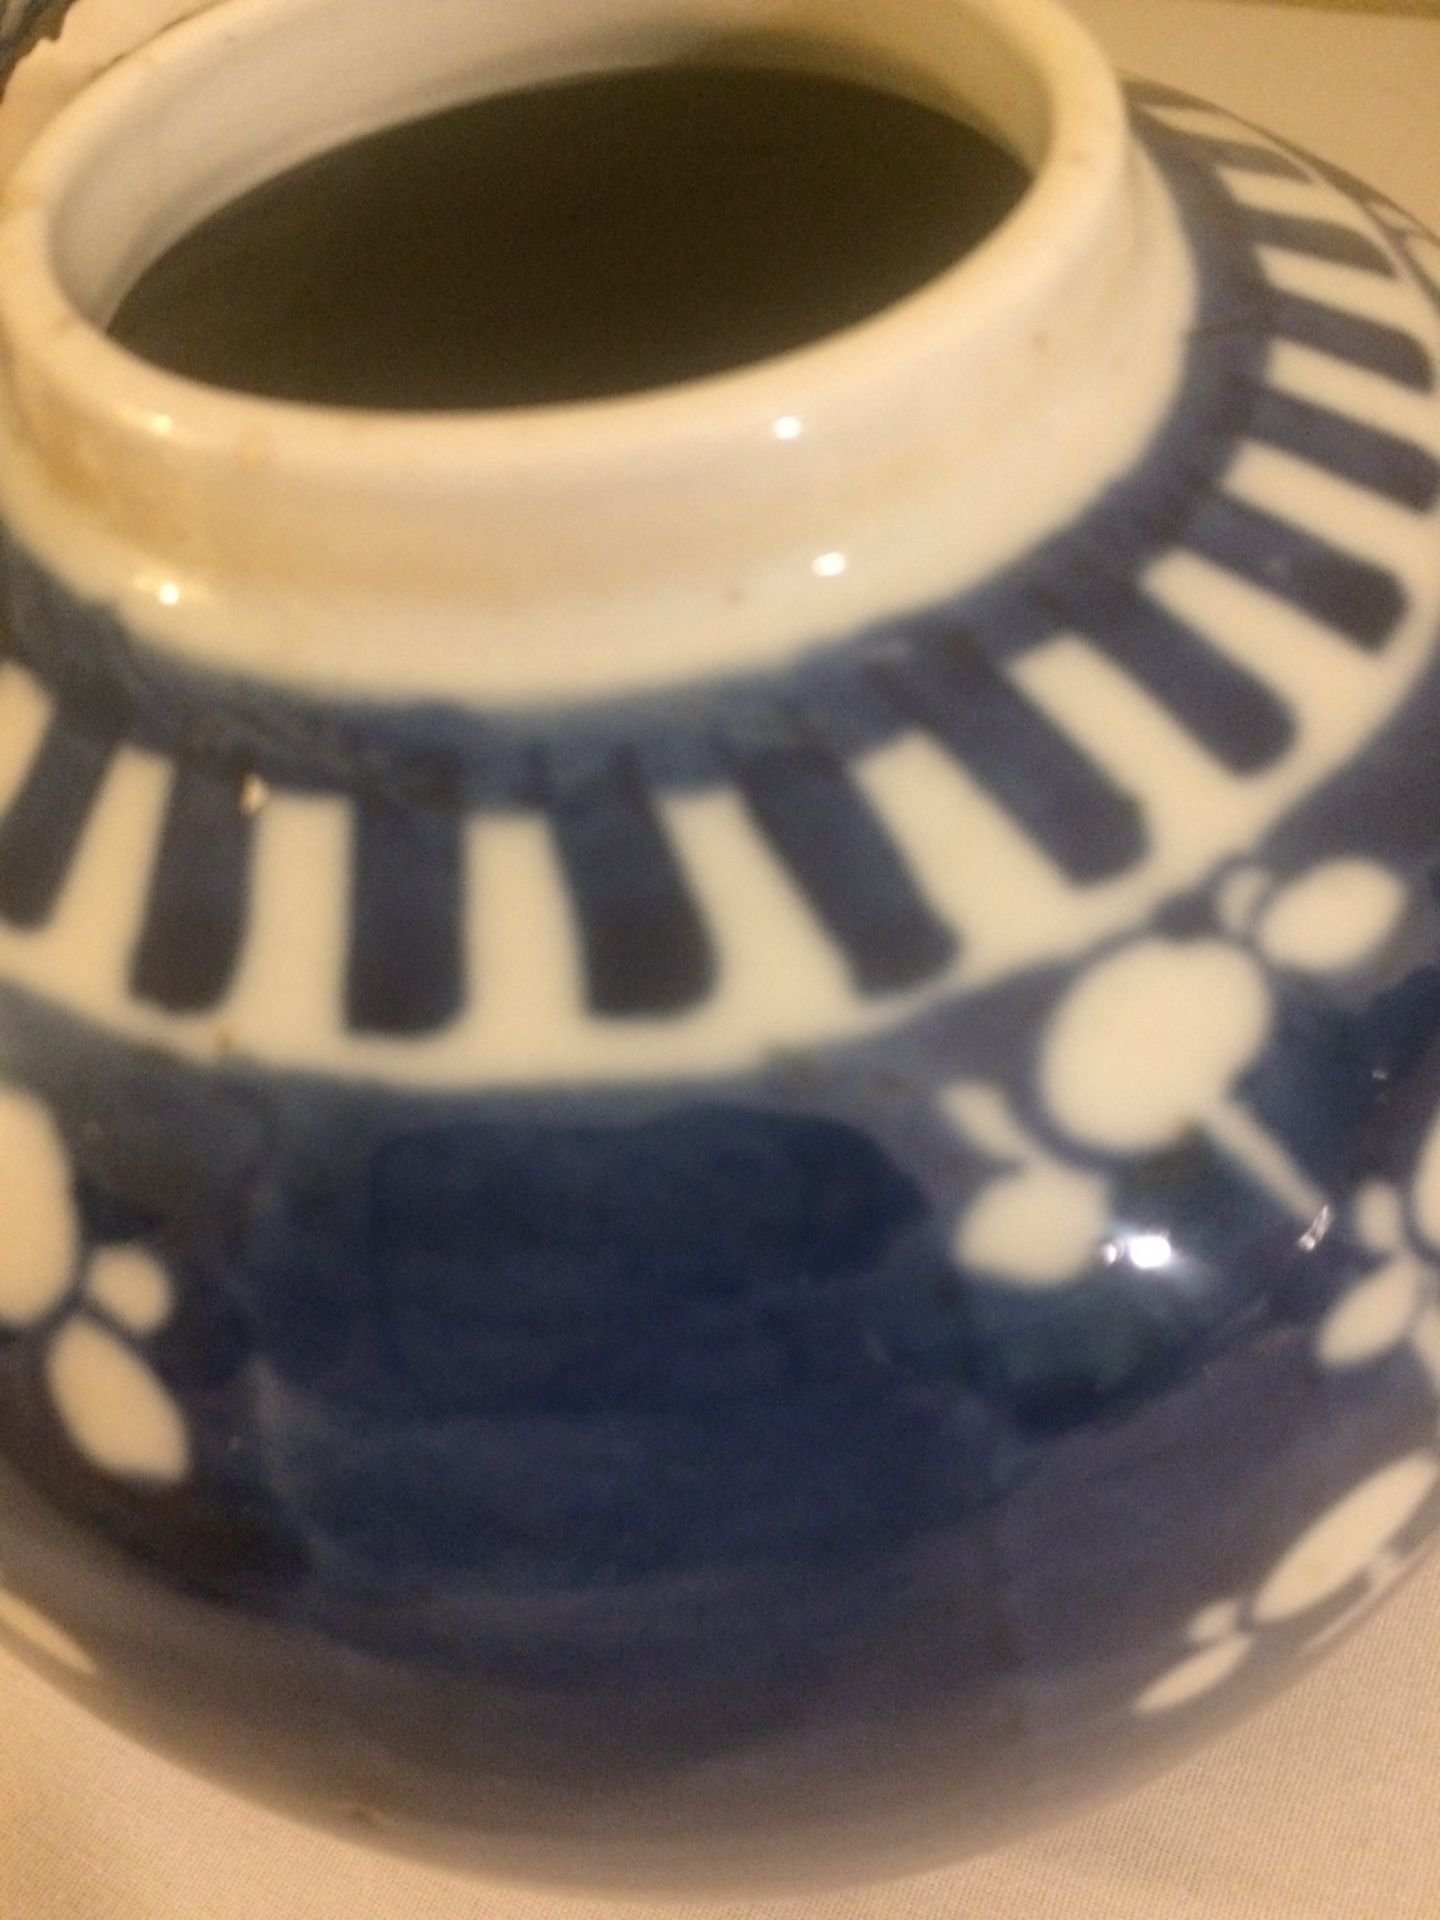 Old Chinese Jar.